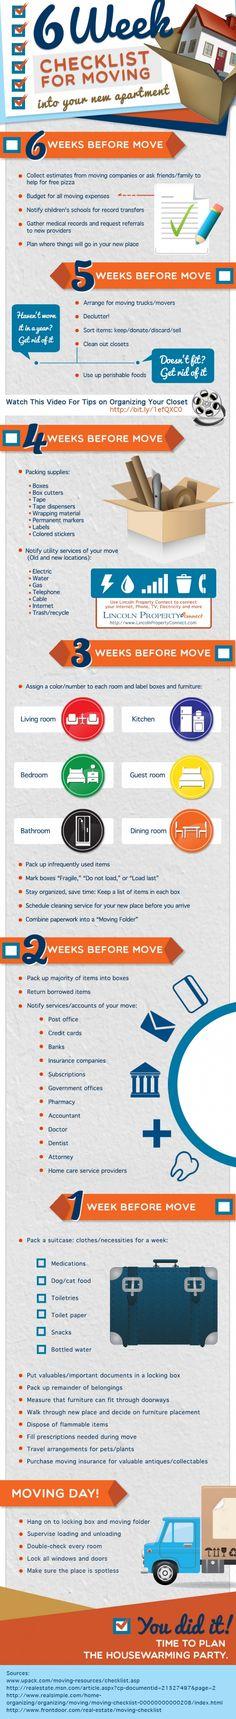 6-Week-Checklist-For-Moving2 http://www.buyorsellhomesinrichmondva.com/ #RichmondVA #RichmondVArealestate #Realestate #realestateVirginia